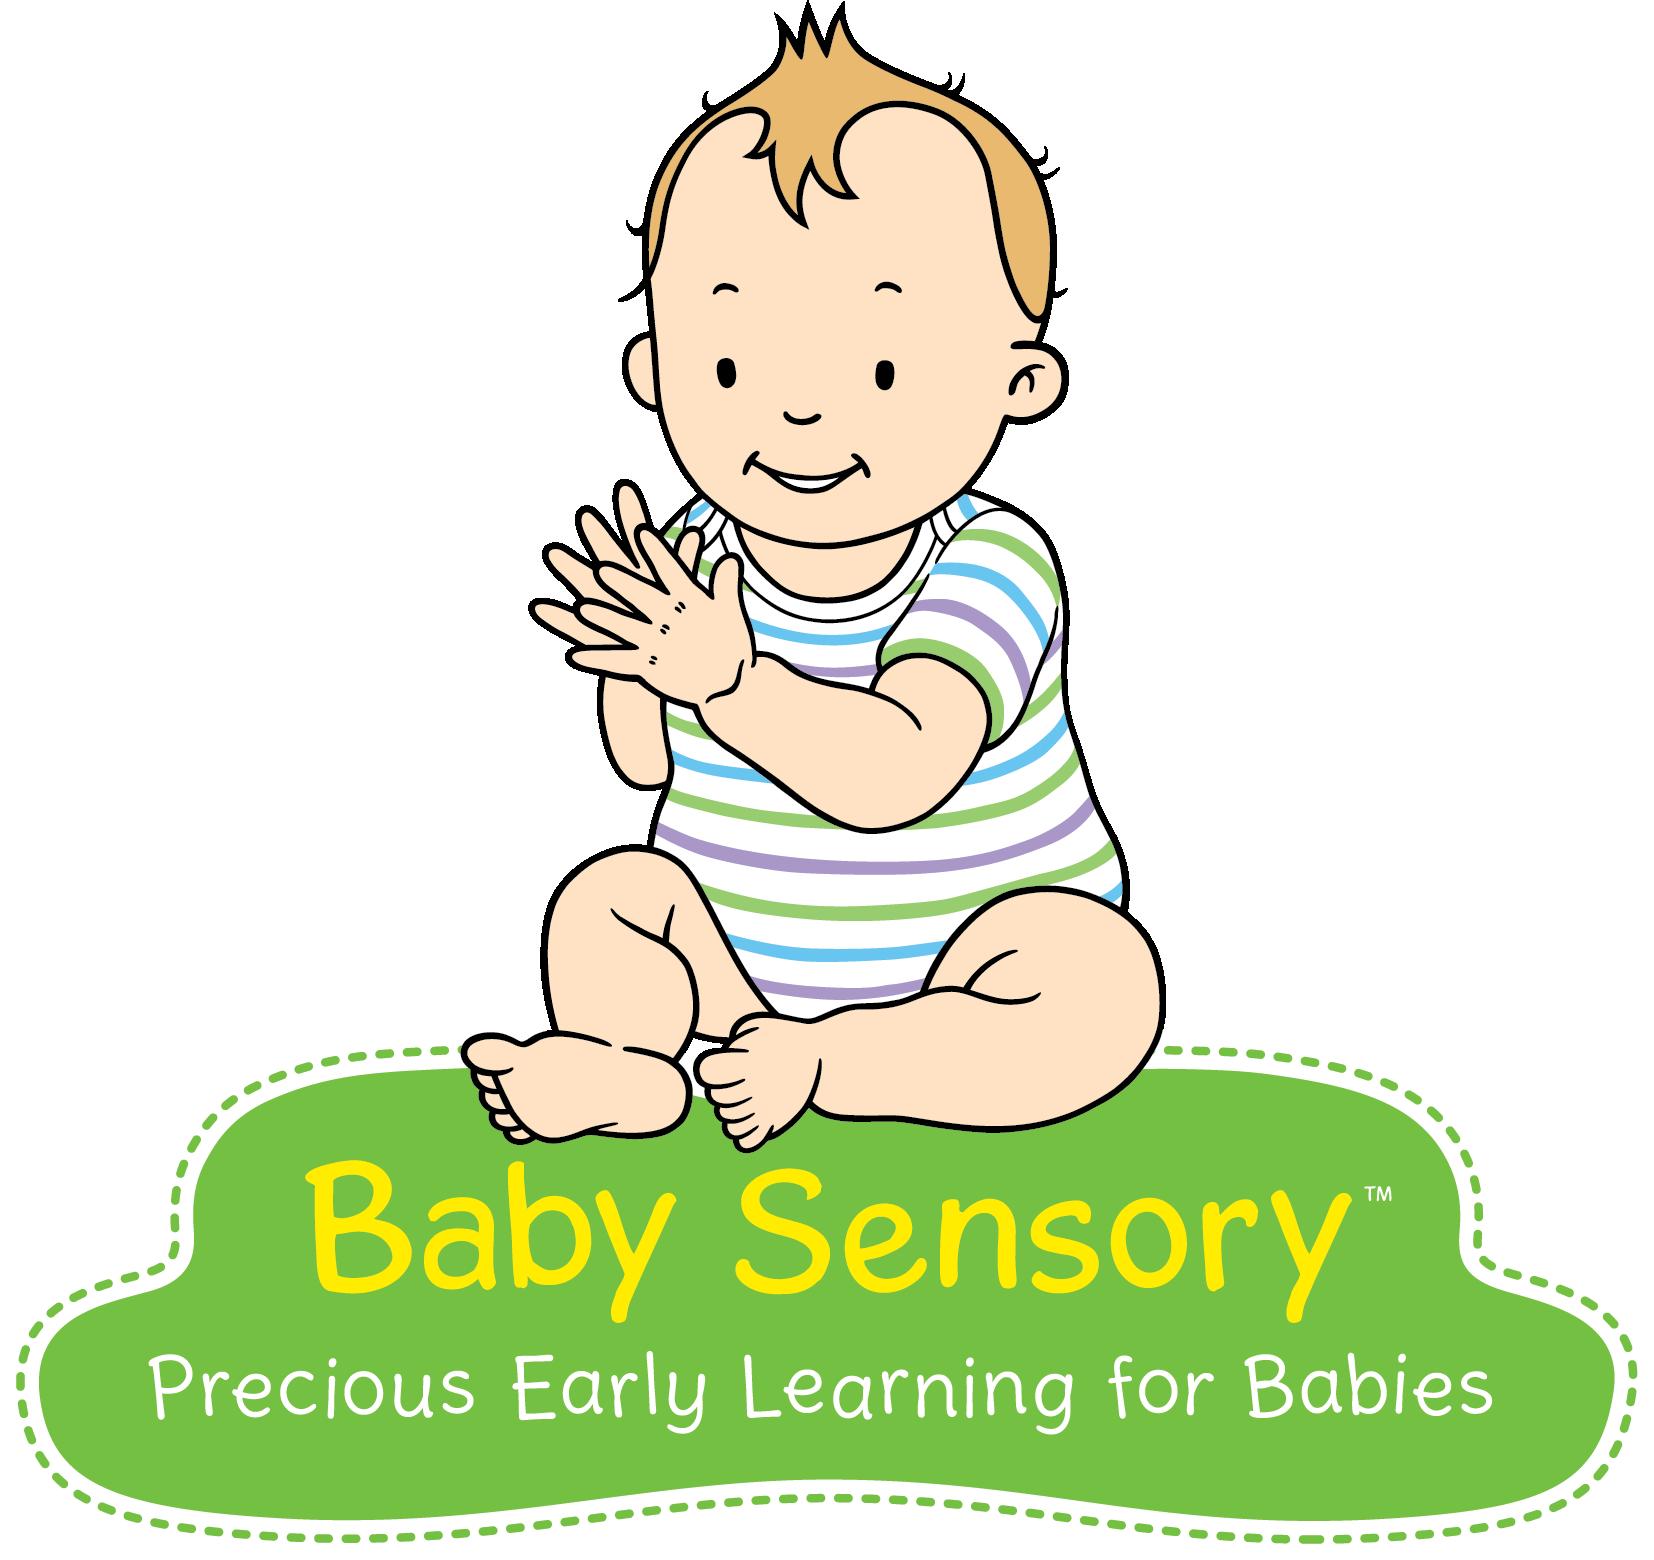 Baby Sensory Salisbury, Romsey & Totton's logo